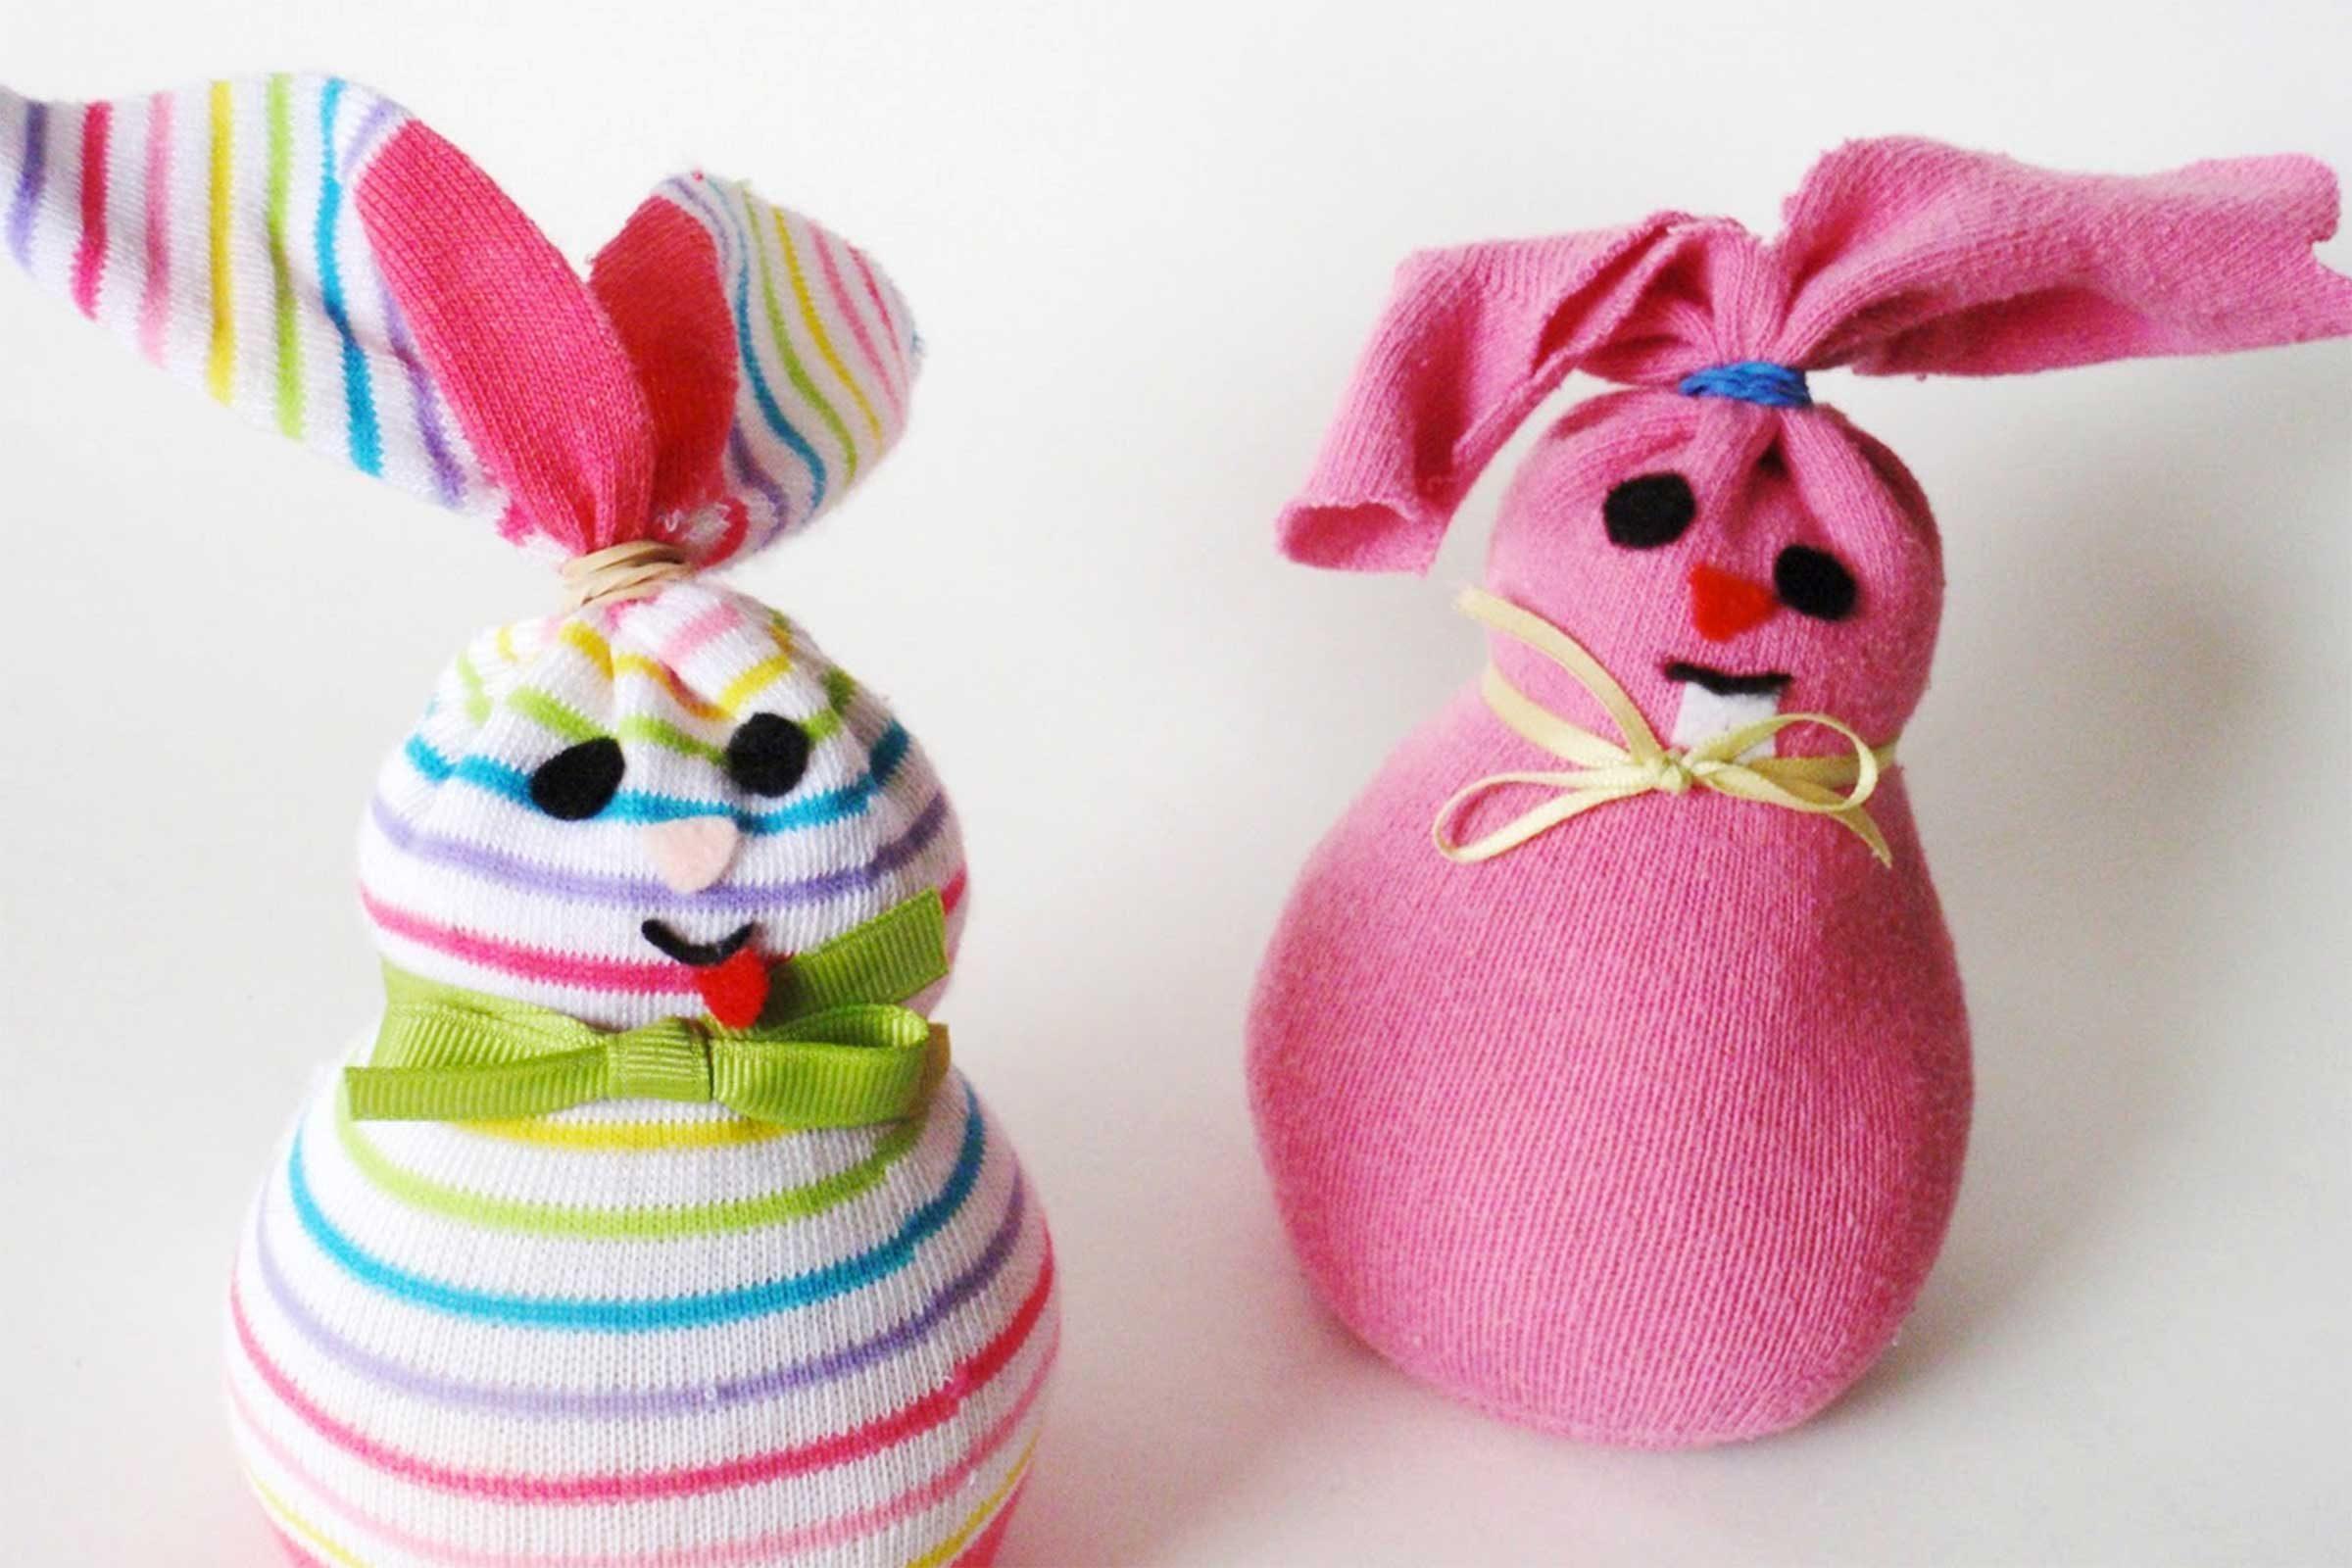 Easter Egg Decorating Ideas For Preschoolers